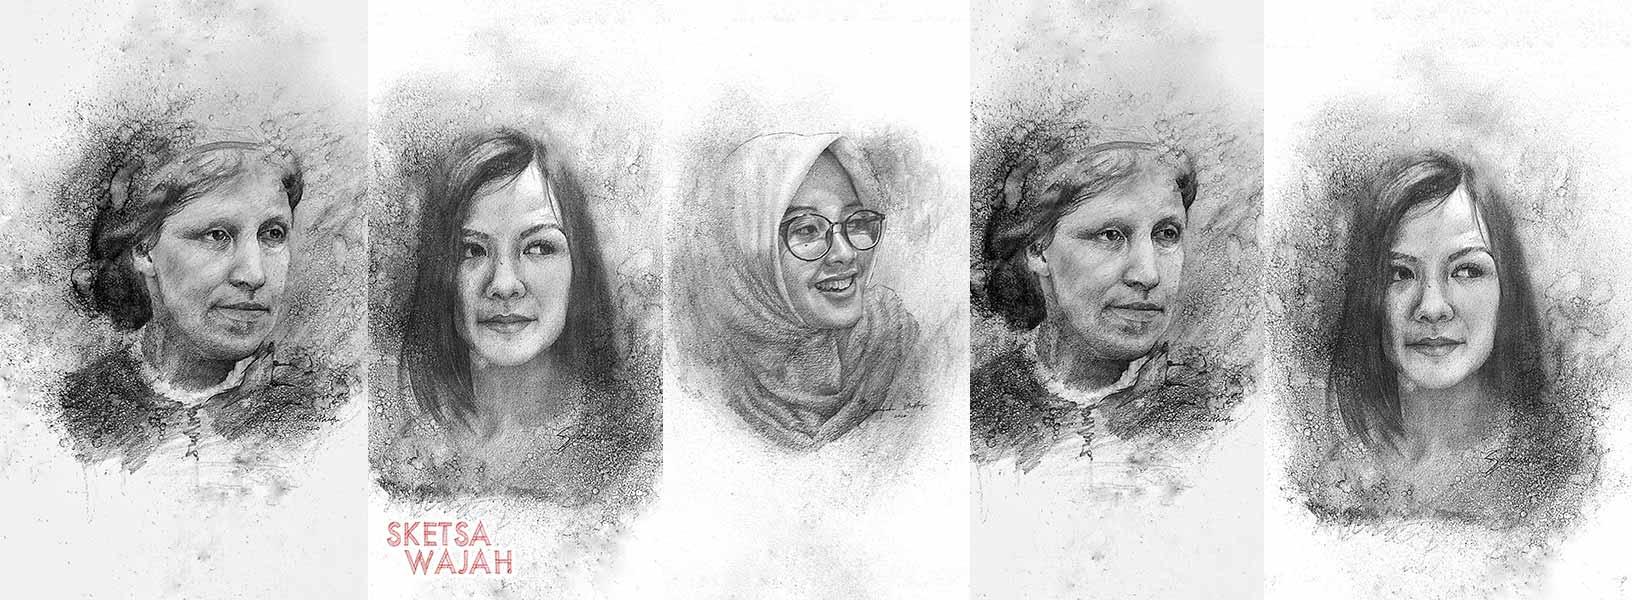 Karya Syarifudin Musthofa sketcher Sketsa Wajah